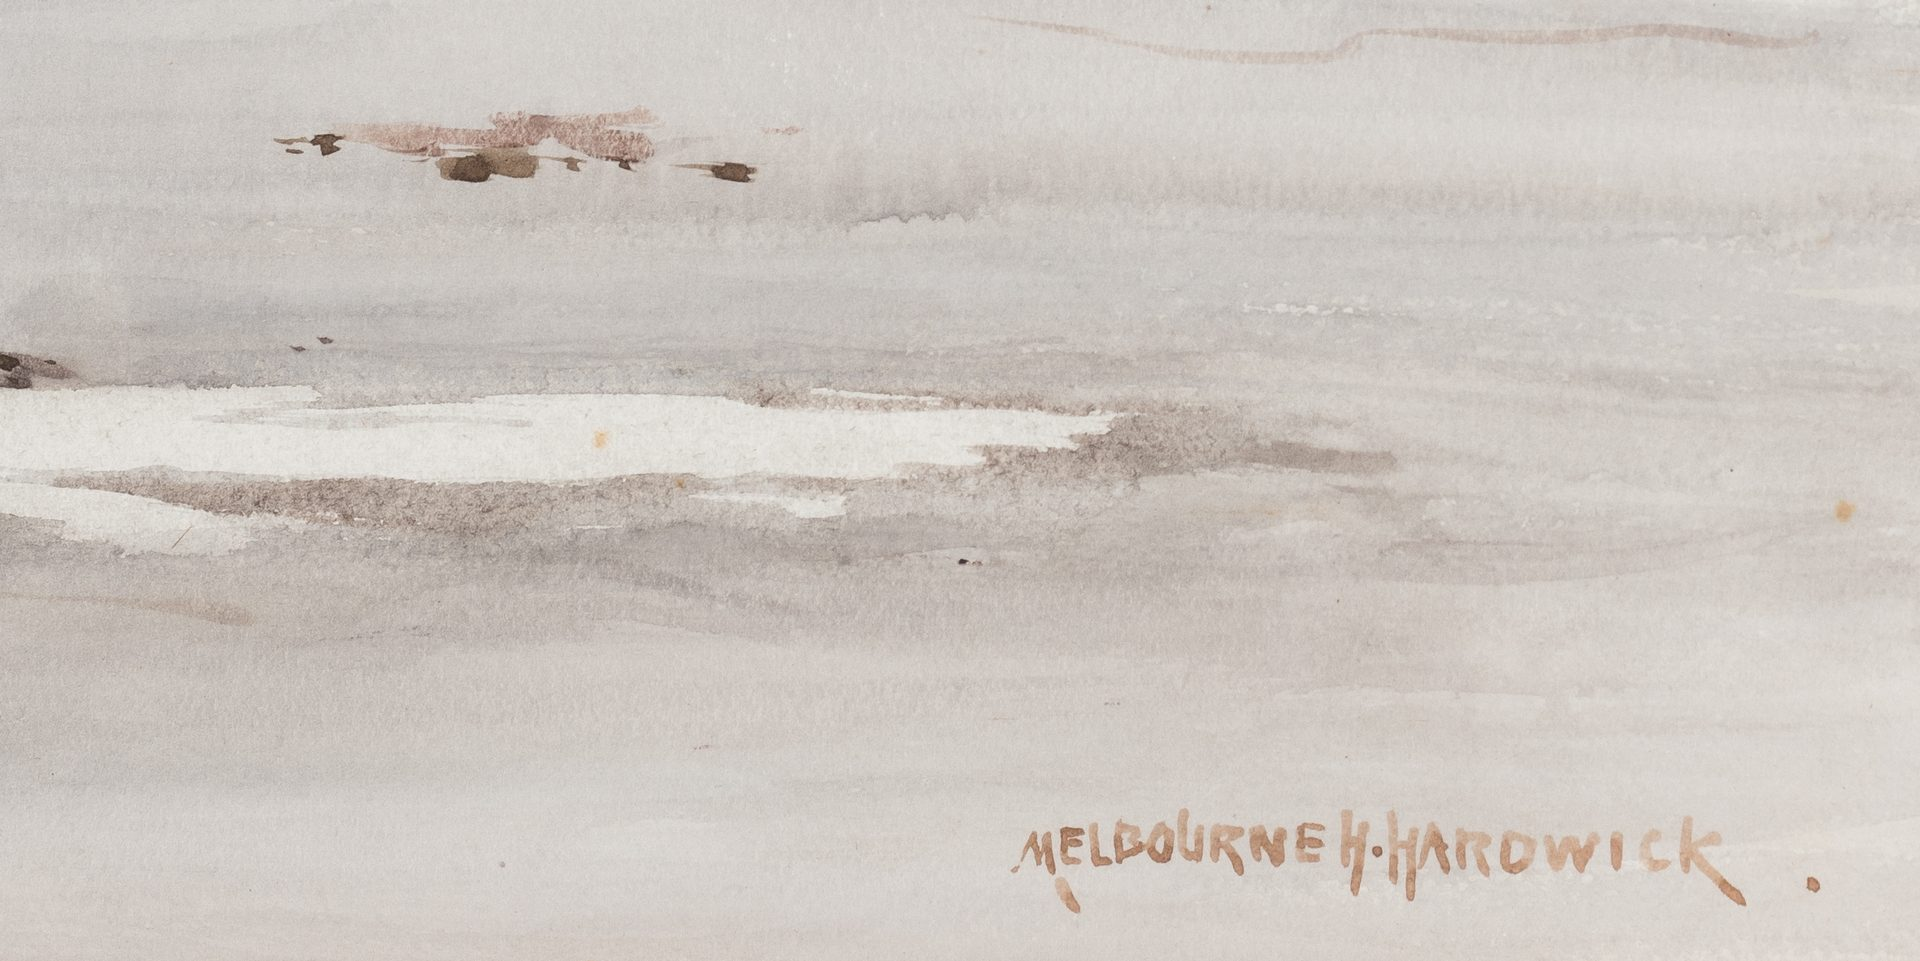 Lot 136: Melbourne H. Hardwick Marine Watercolor